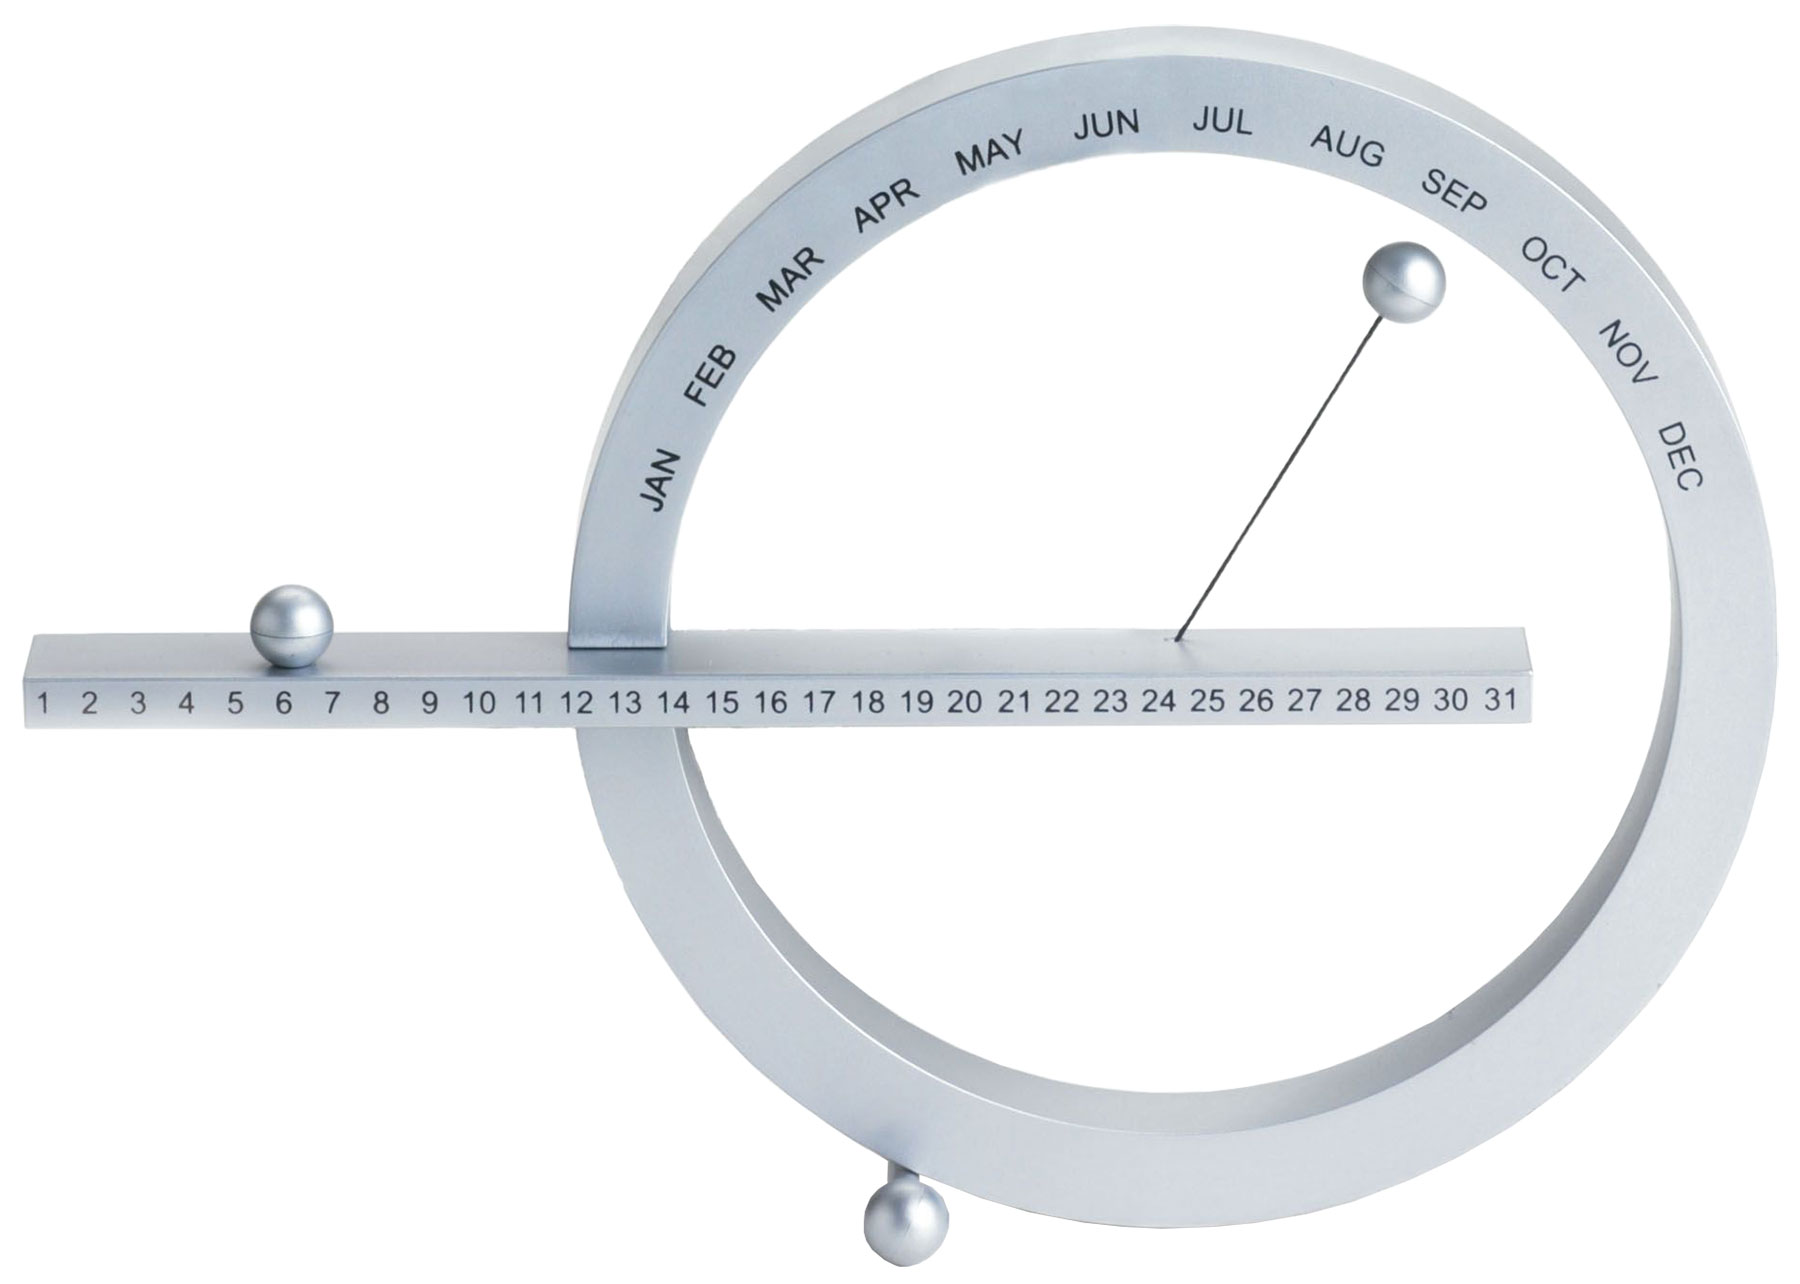 Ewiger Kalender (kleine Version, 14 x 20 cm, silber) - MoMA Kollektion - Design Gideon Dagan